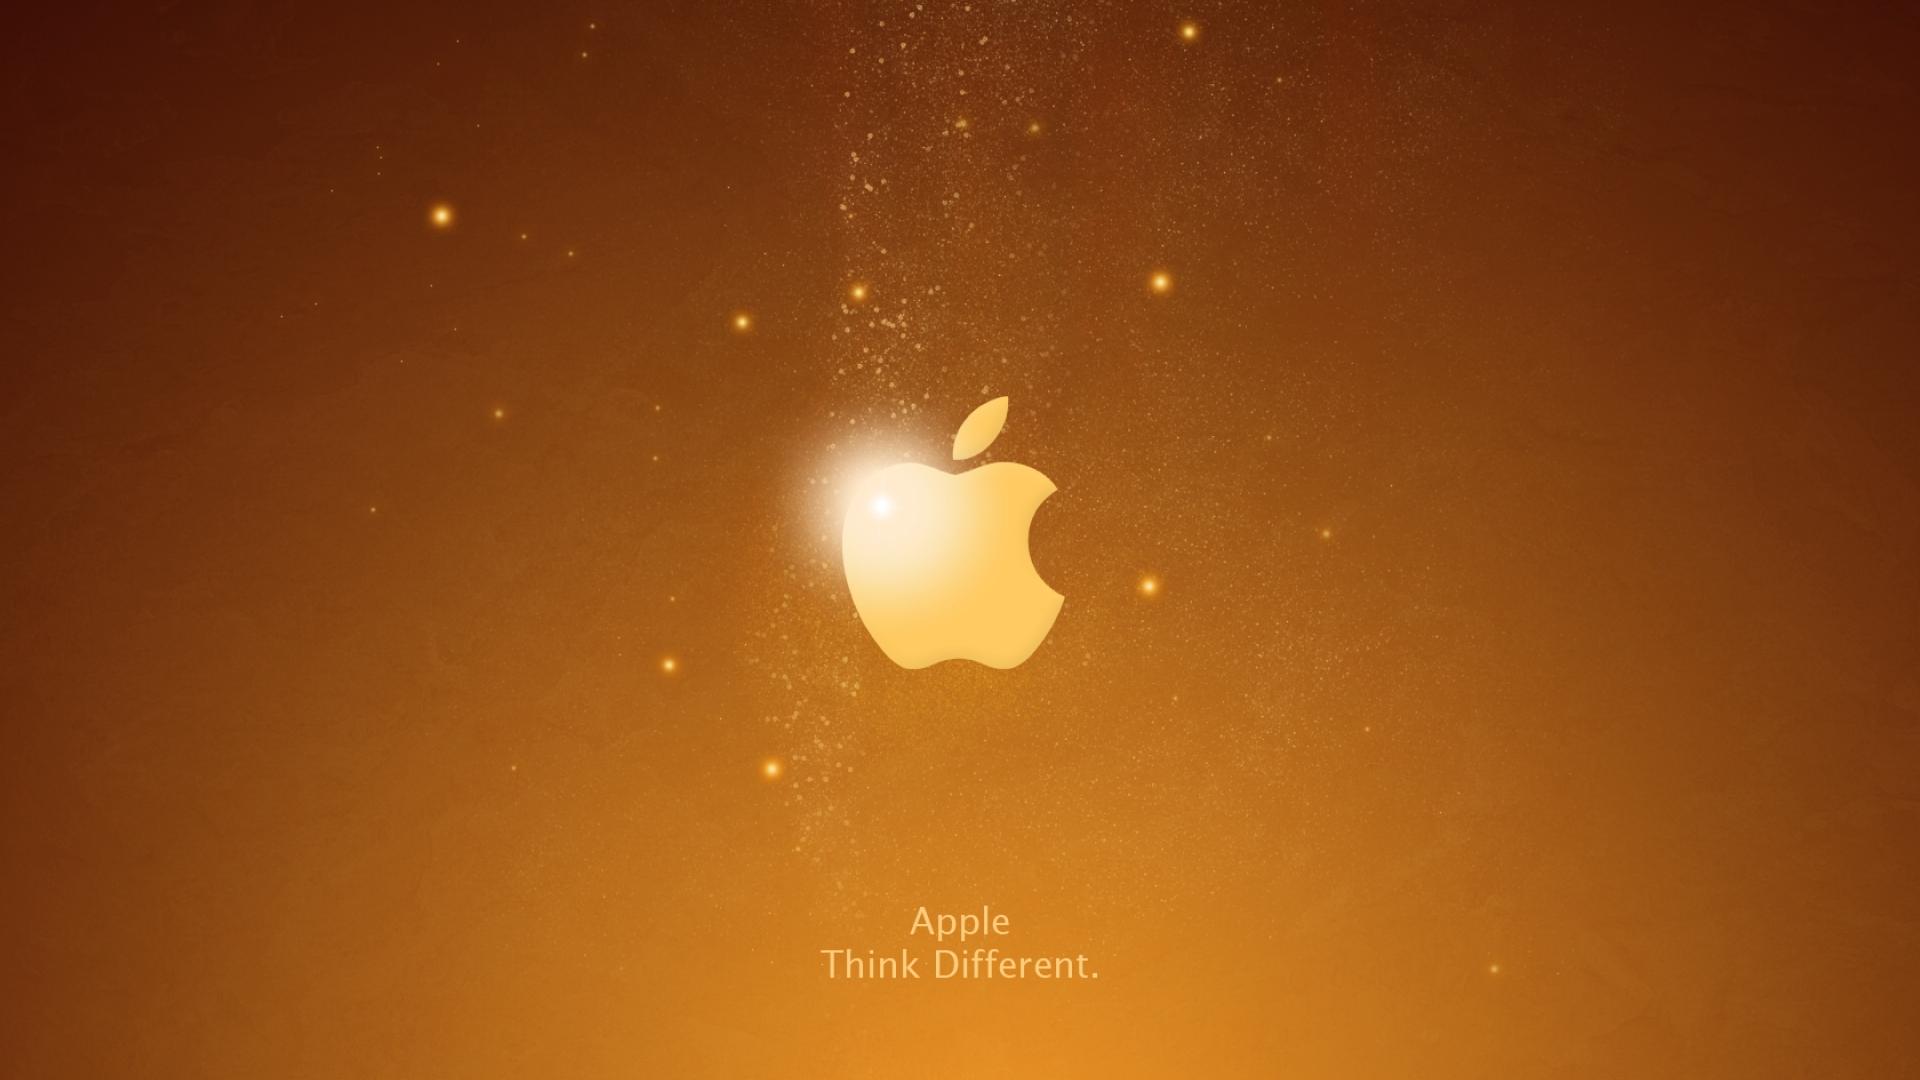 Golden Apple Wallpaper Hd Wallpapers